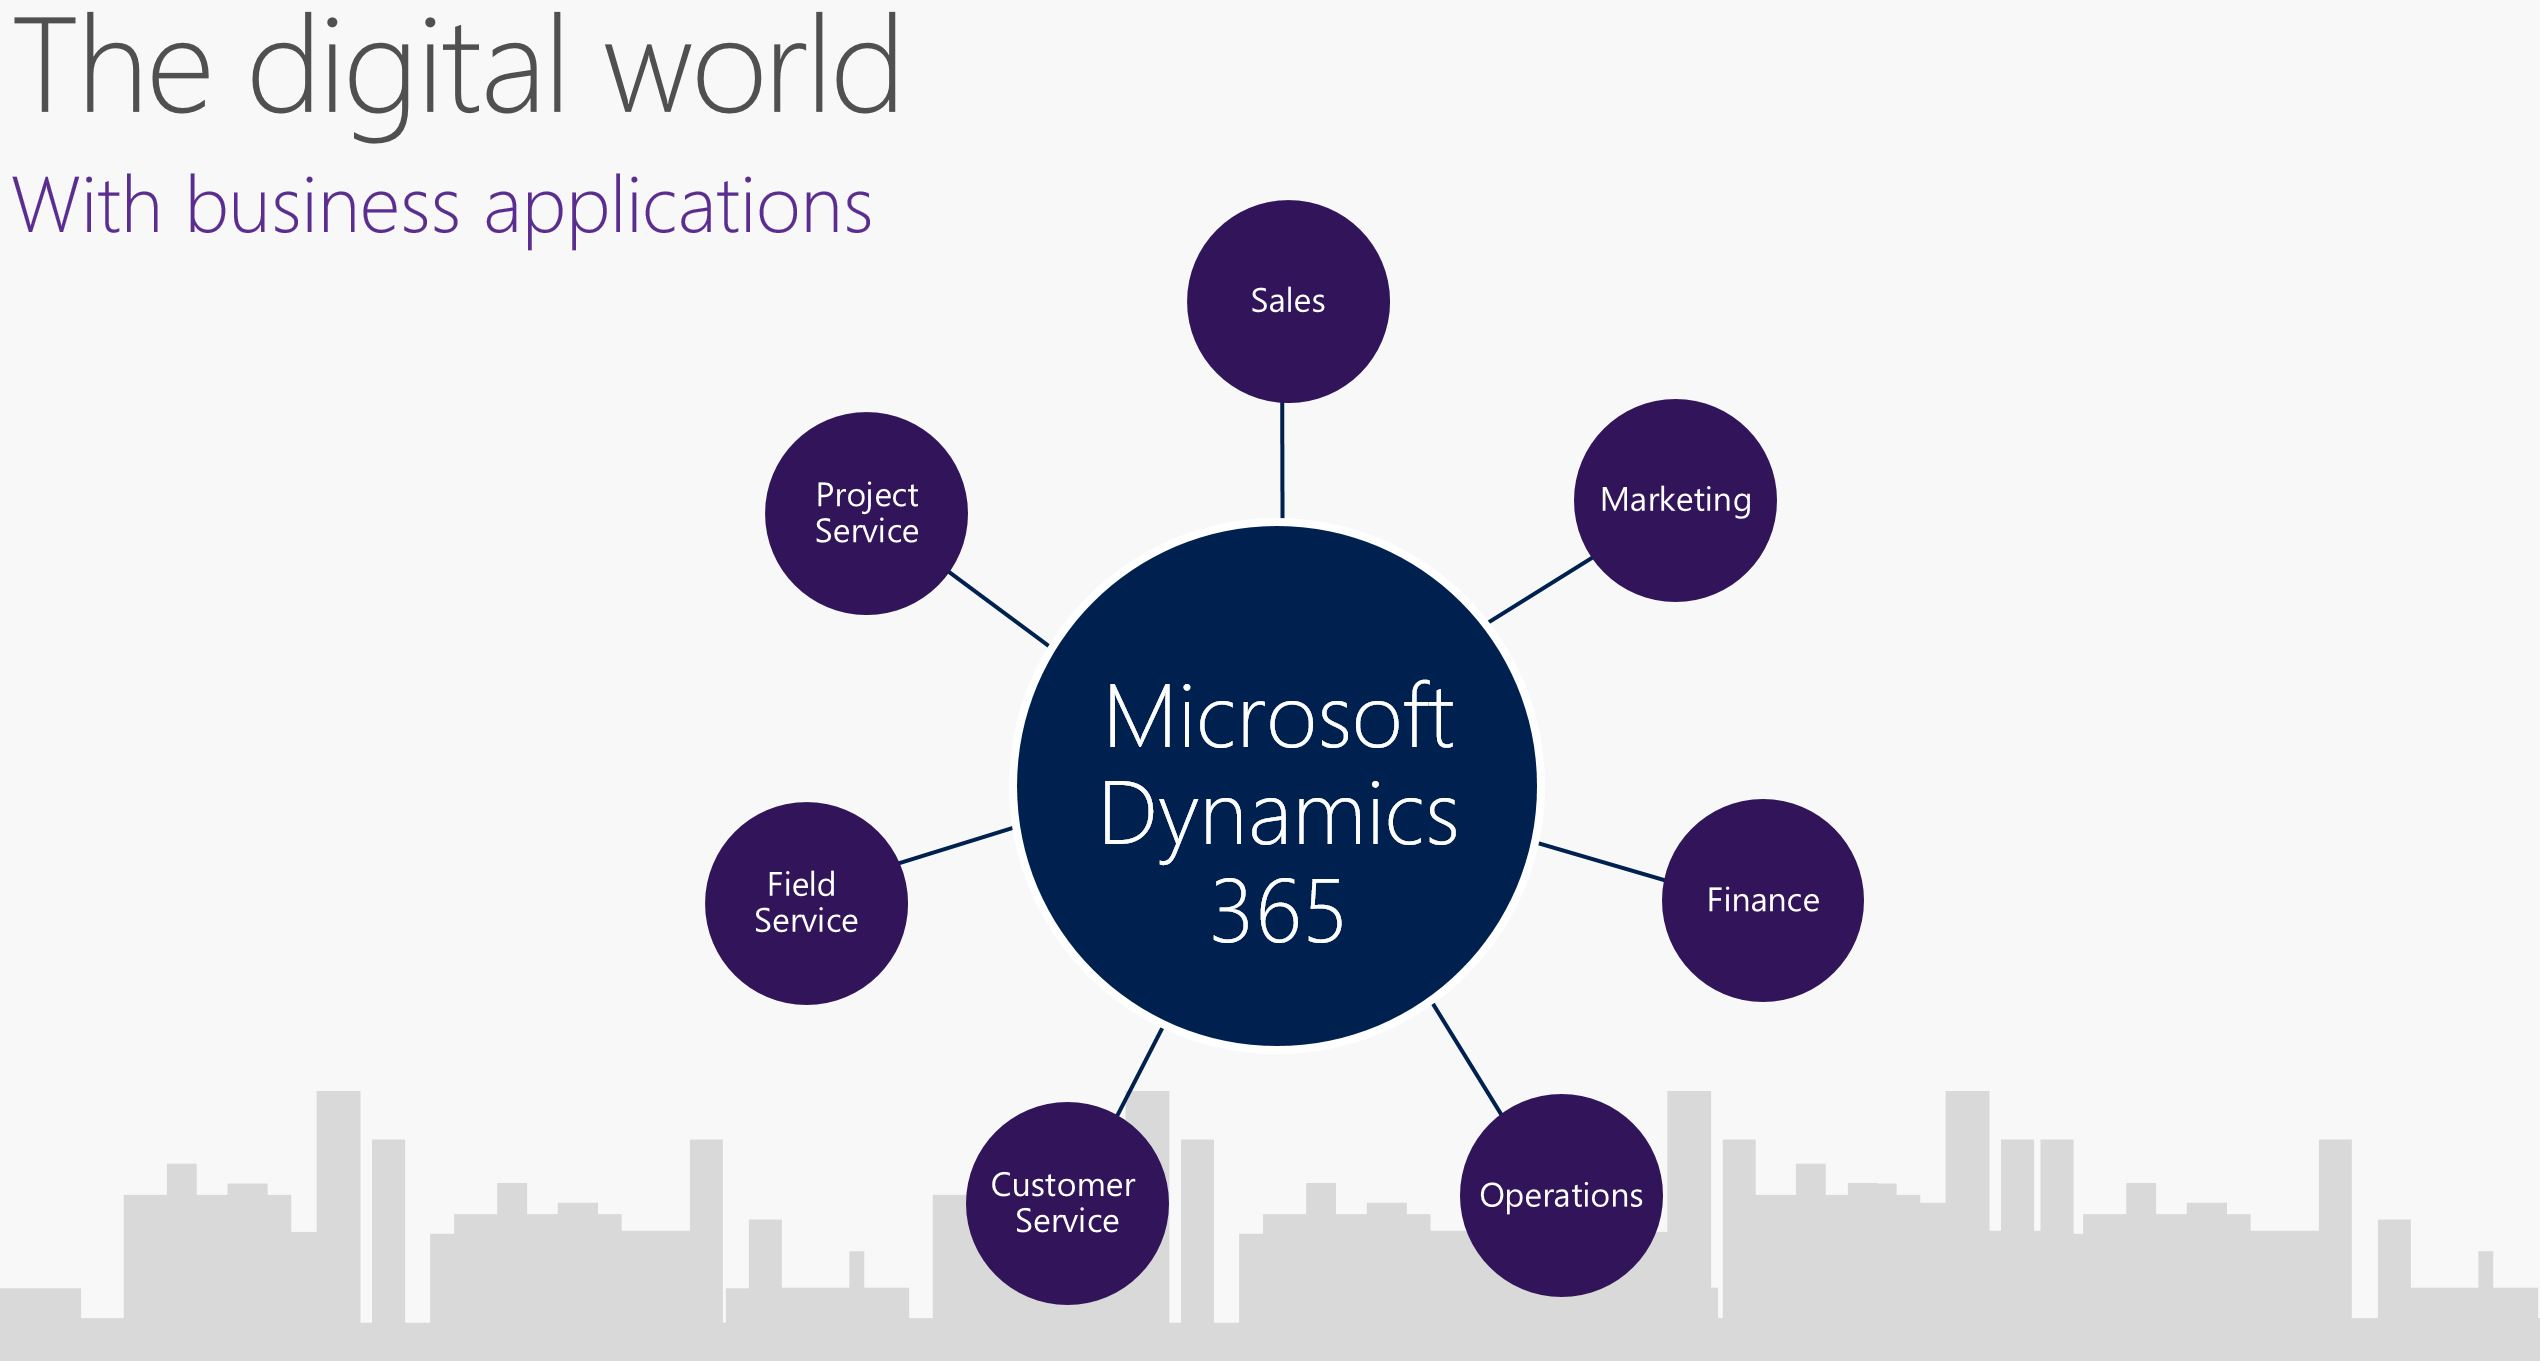 Microsoft Dynamic product line